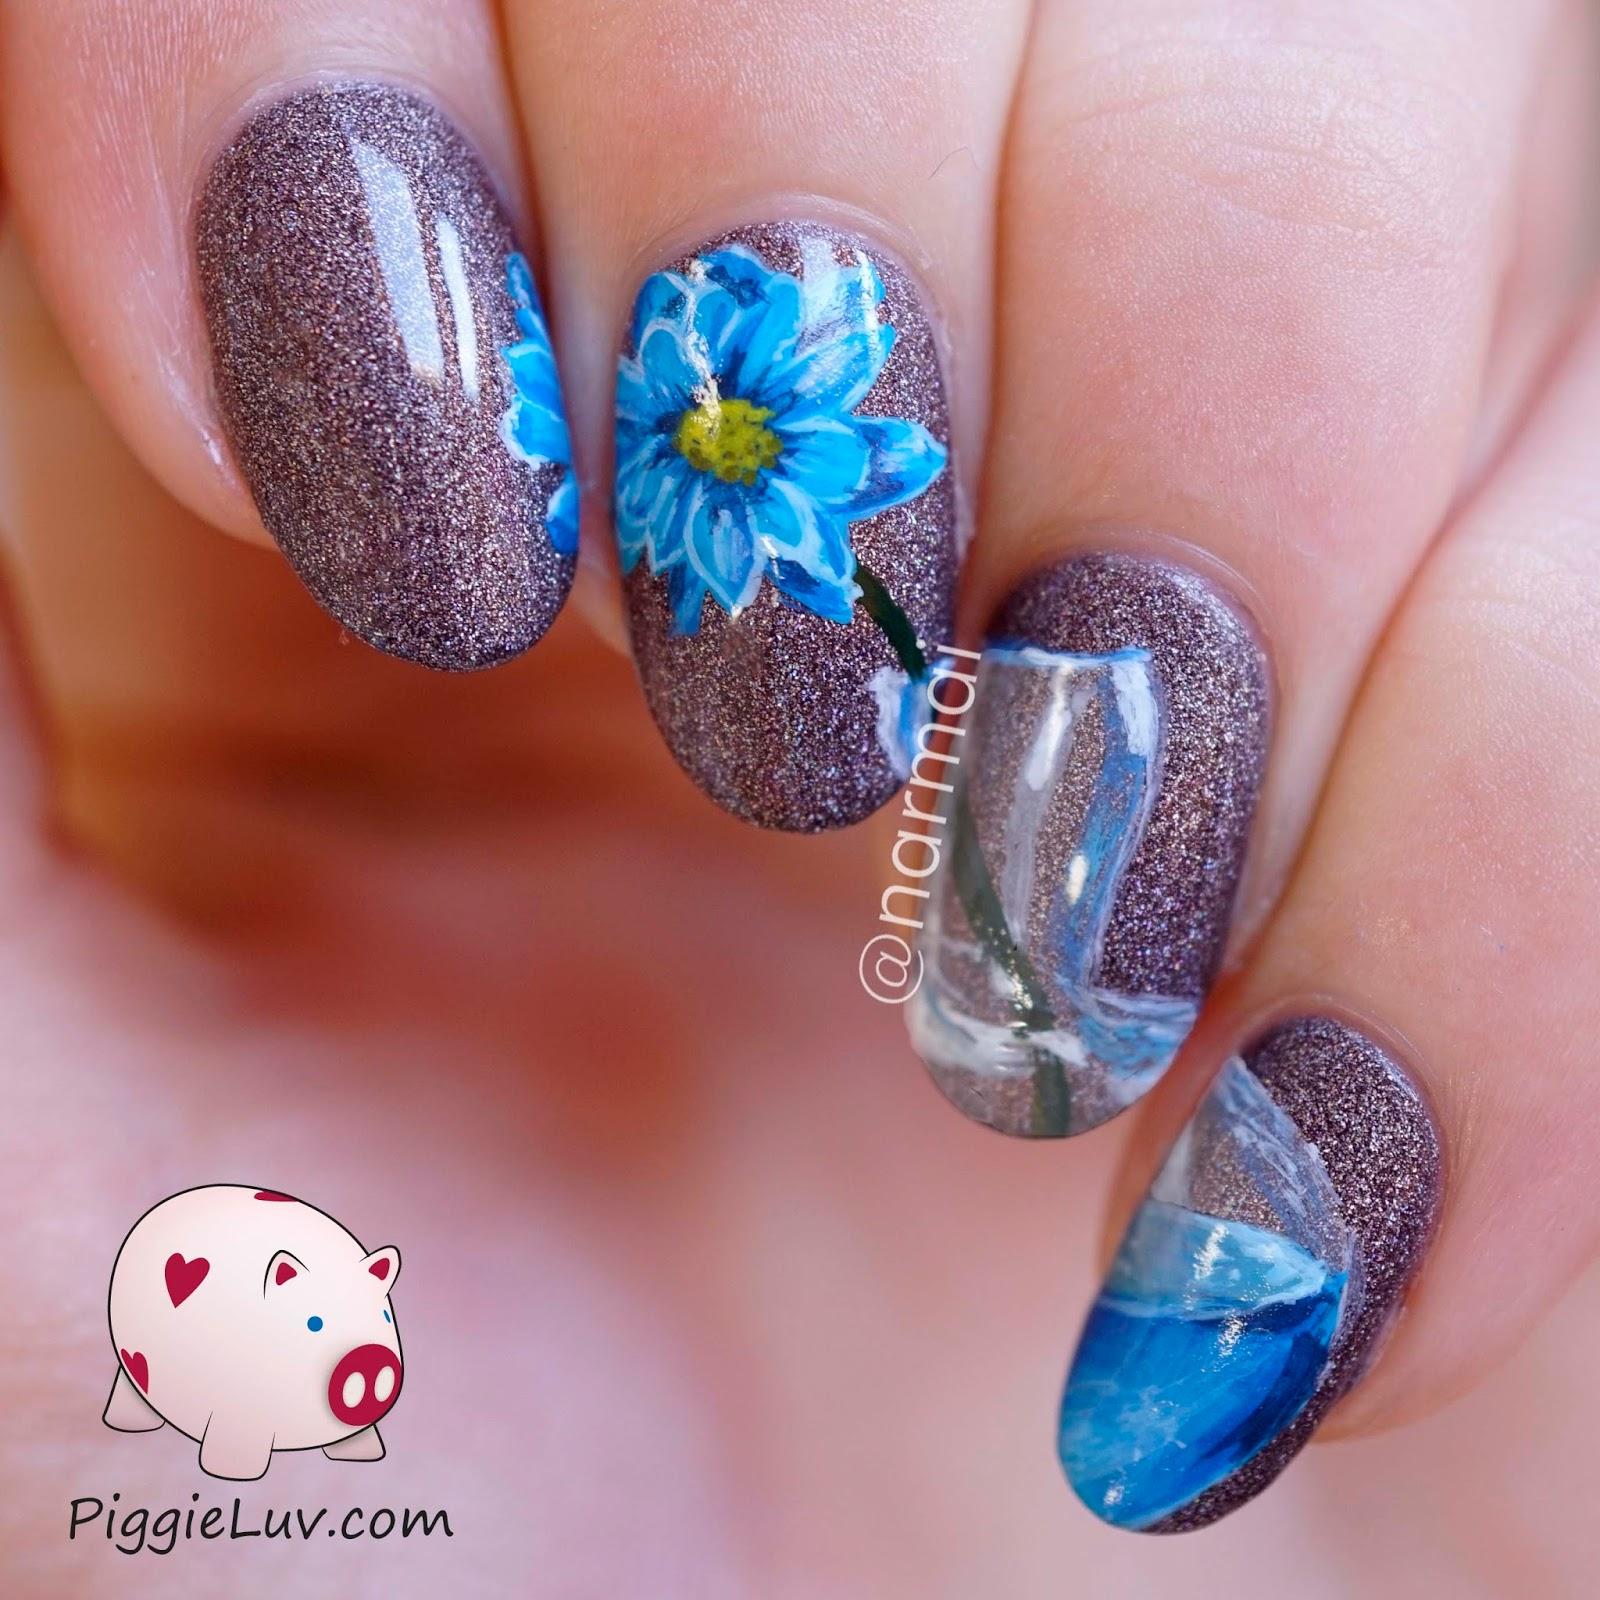 Nail Art Blue Floral: PiggieLuv: Blue Flower In Vase Nail Art